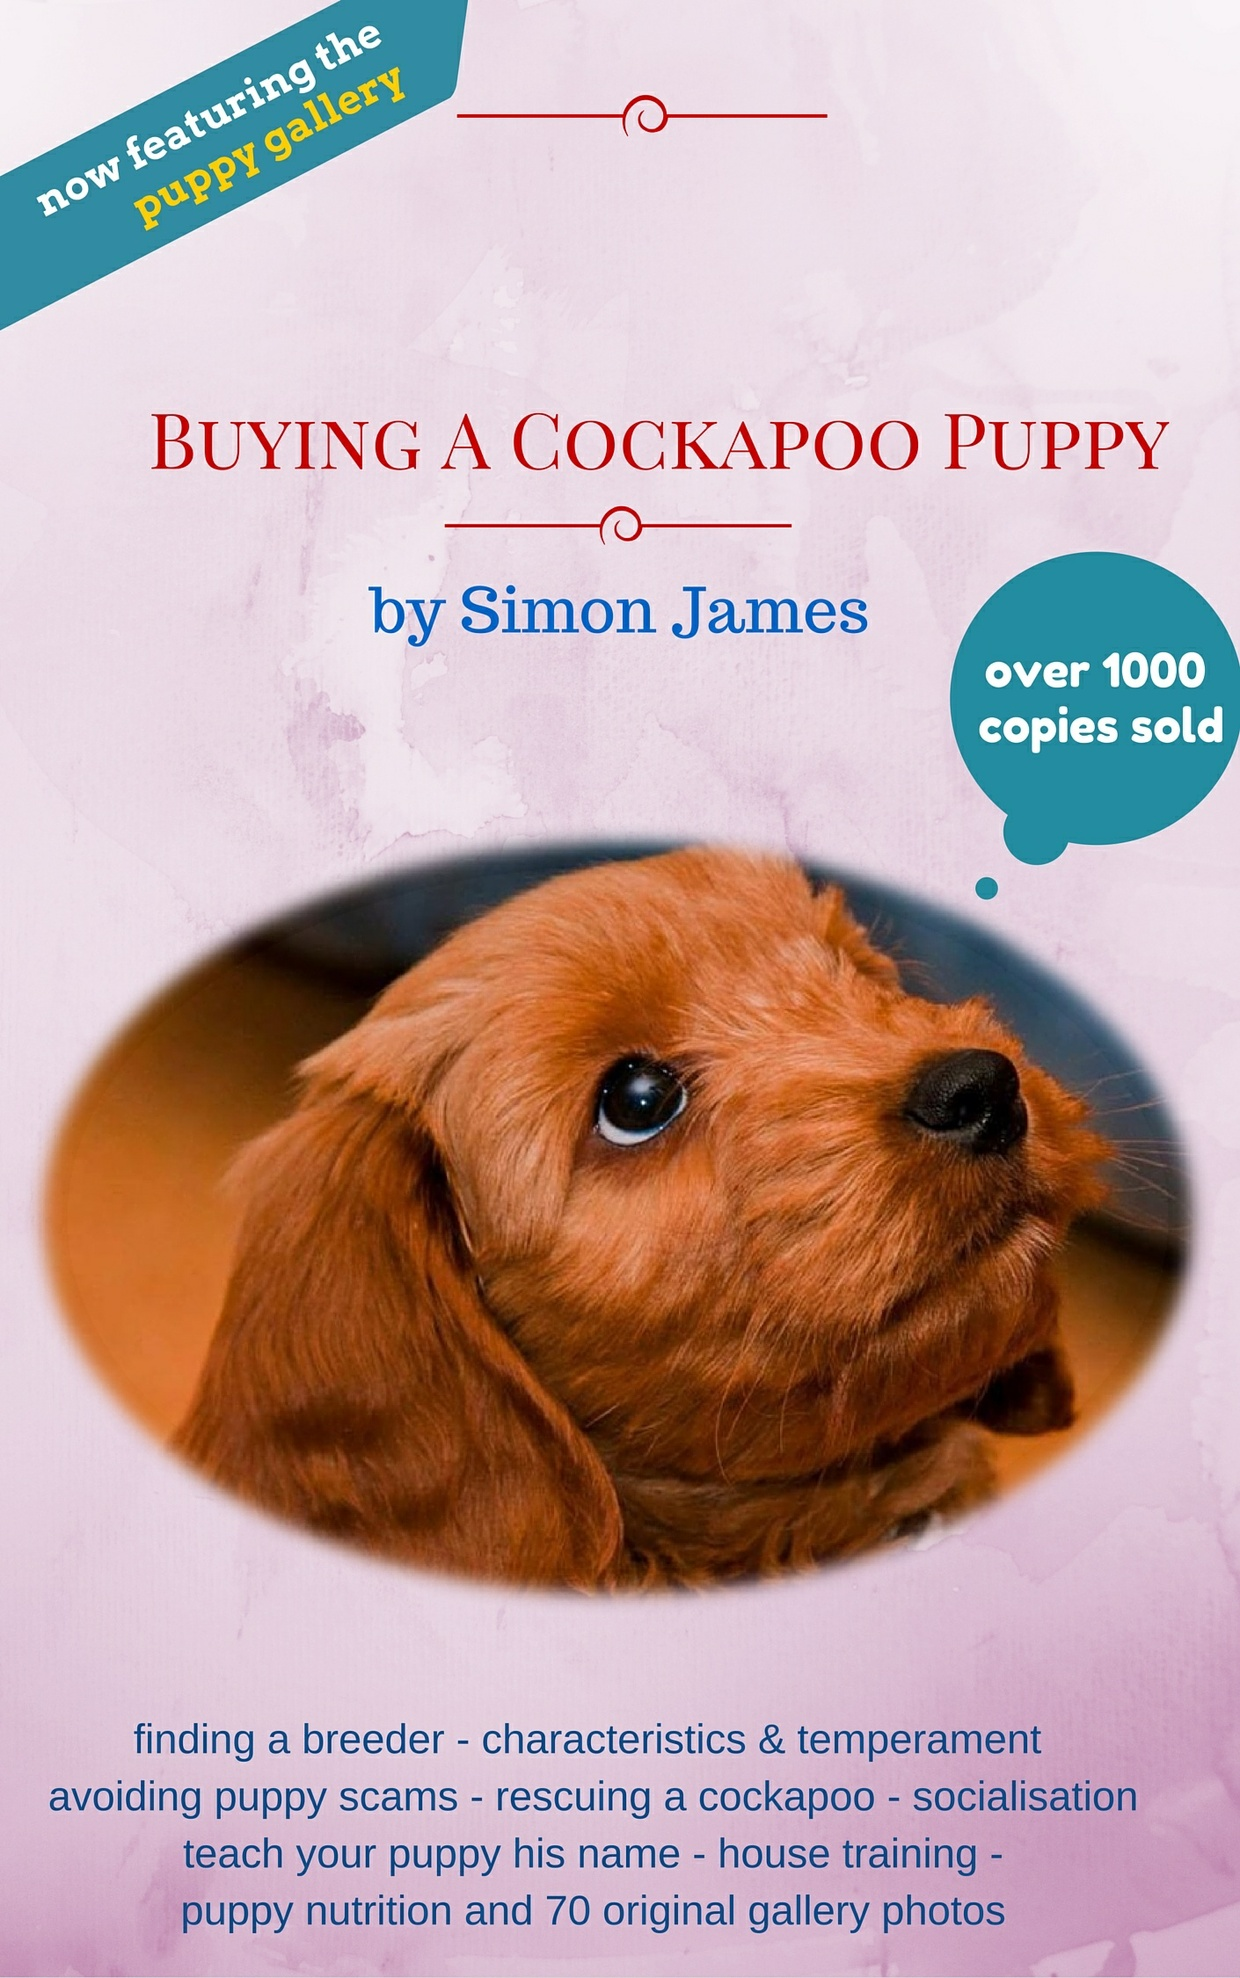 Buying A Cockapoo Puppy